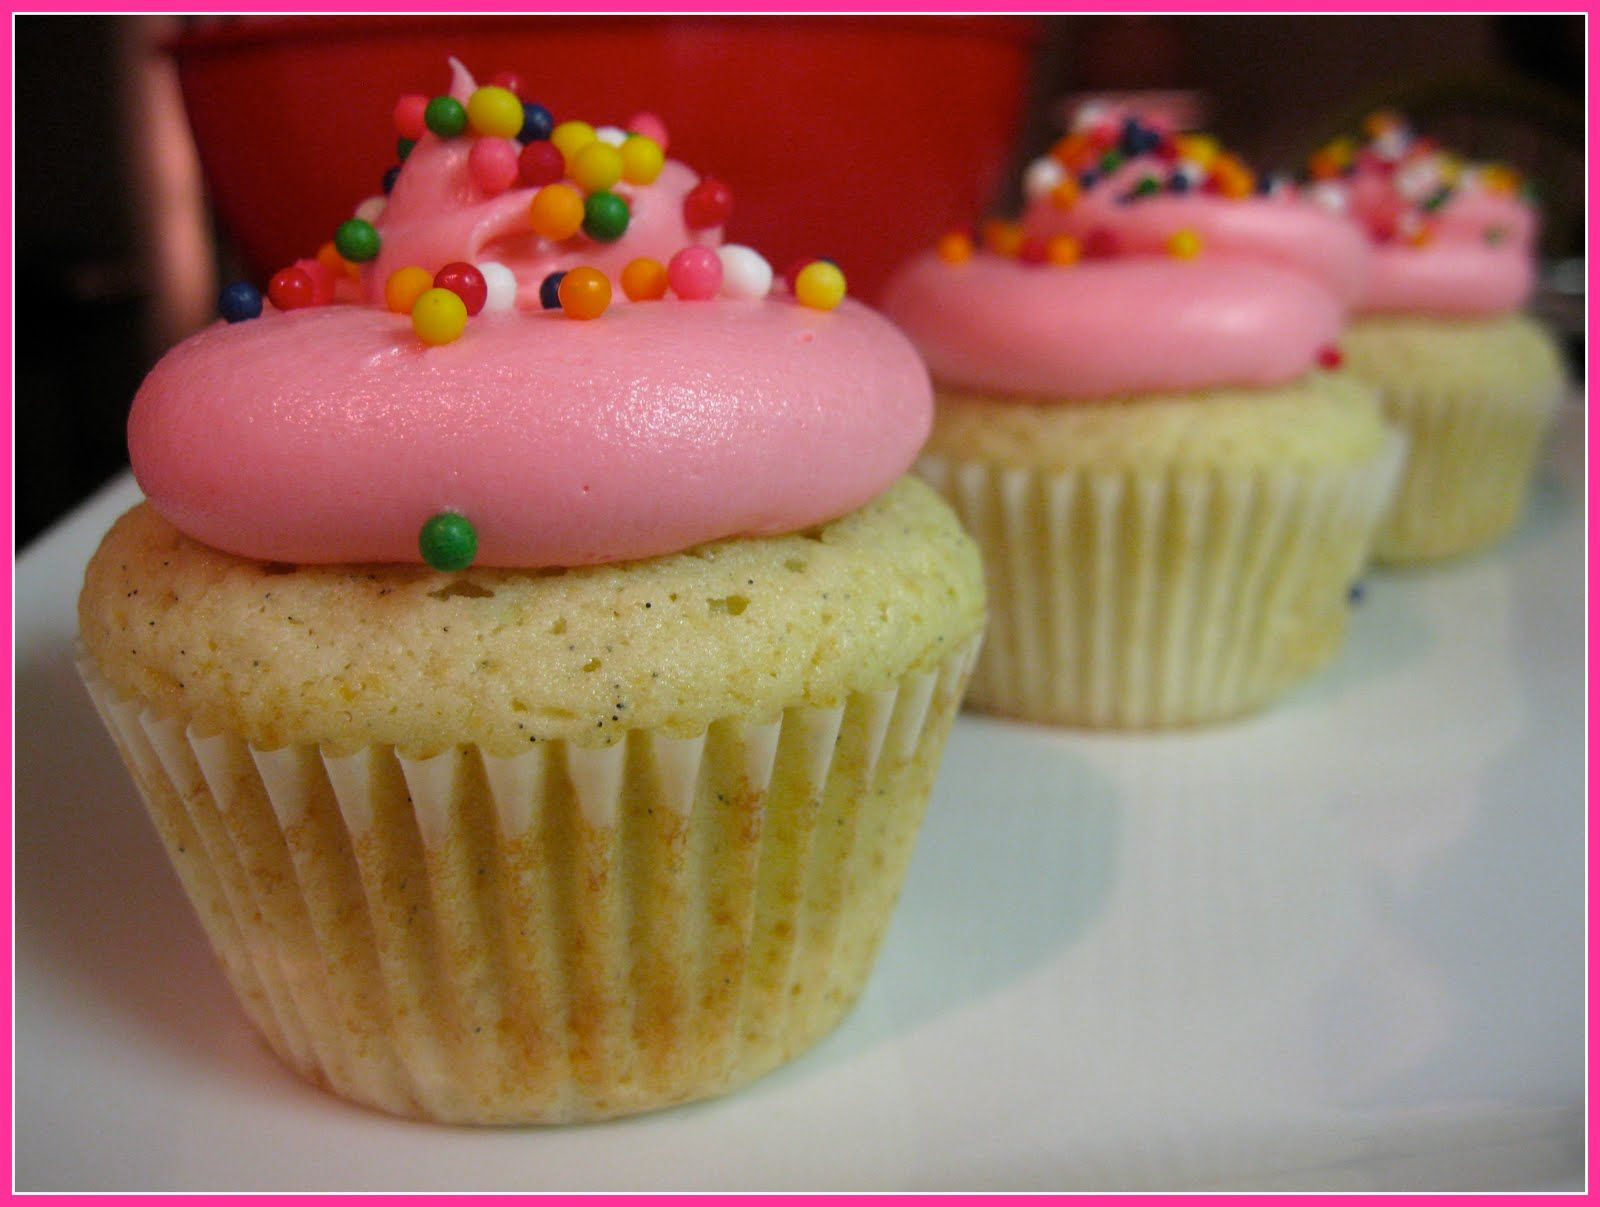 cupcake recipes from scratch